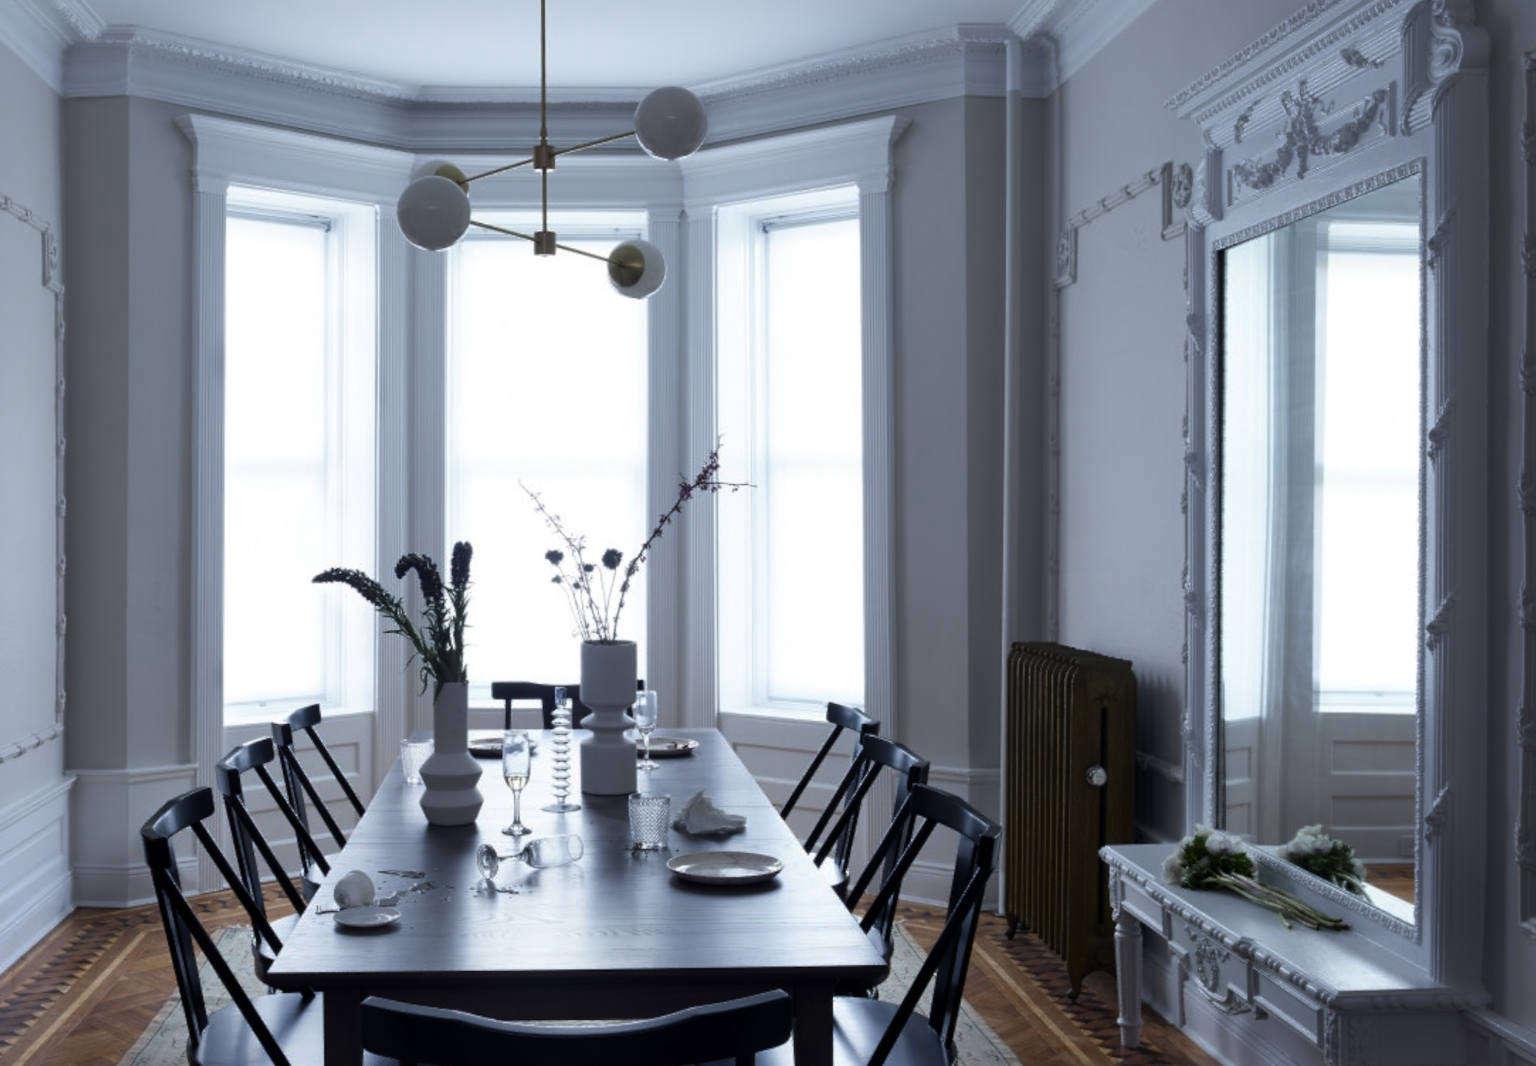 arthurs brooklyn brownstone dining room james john jetel